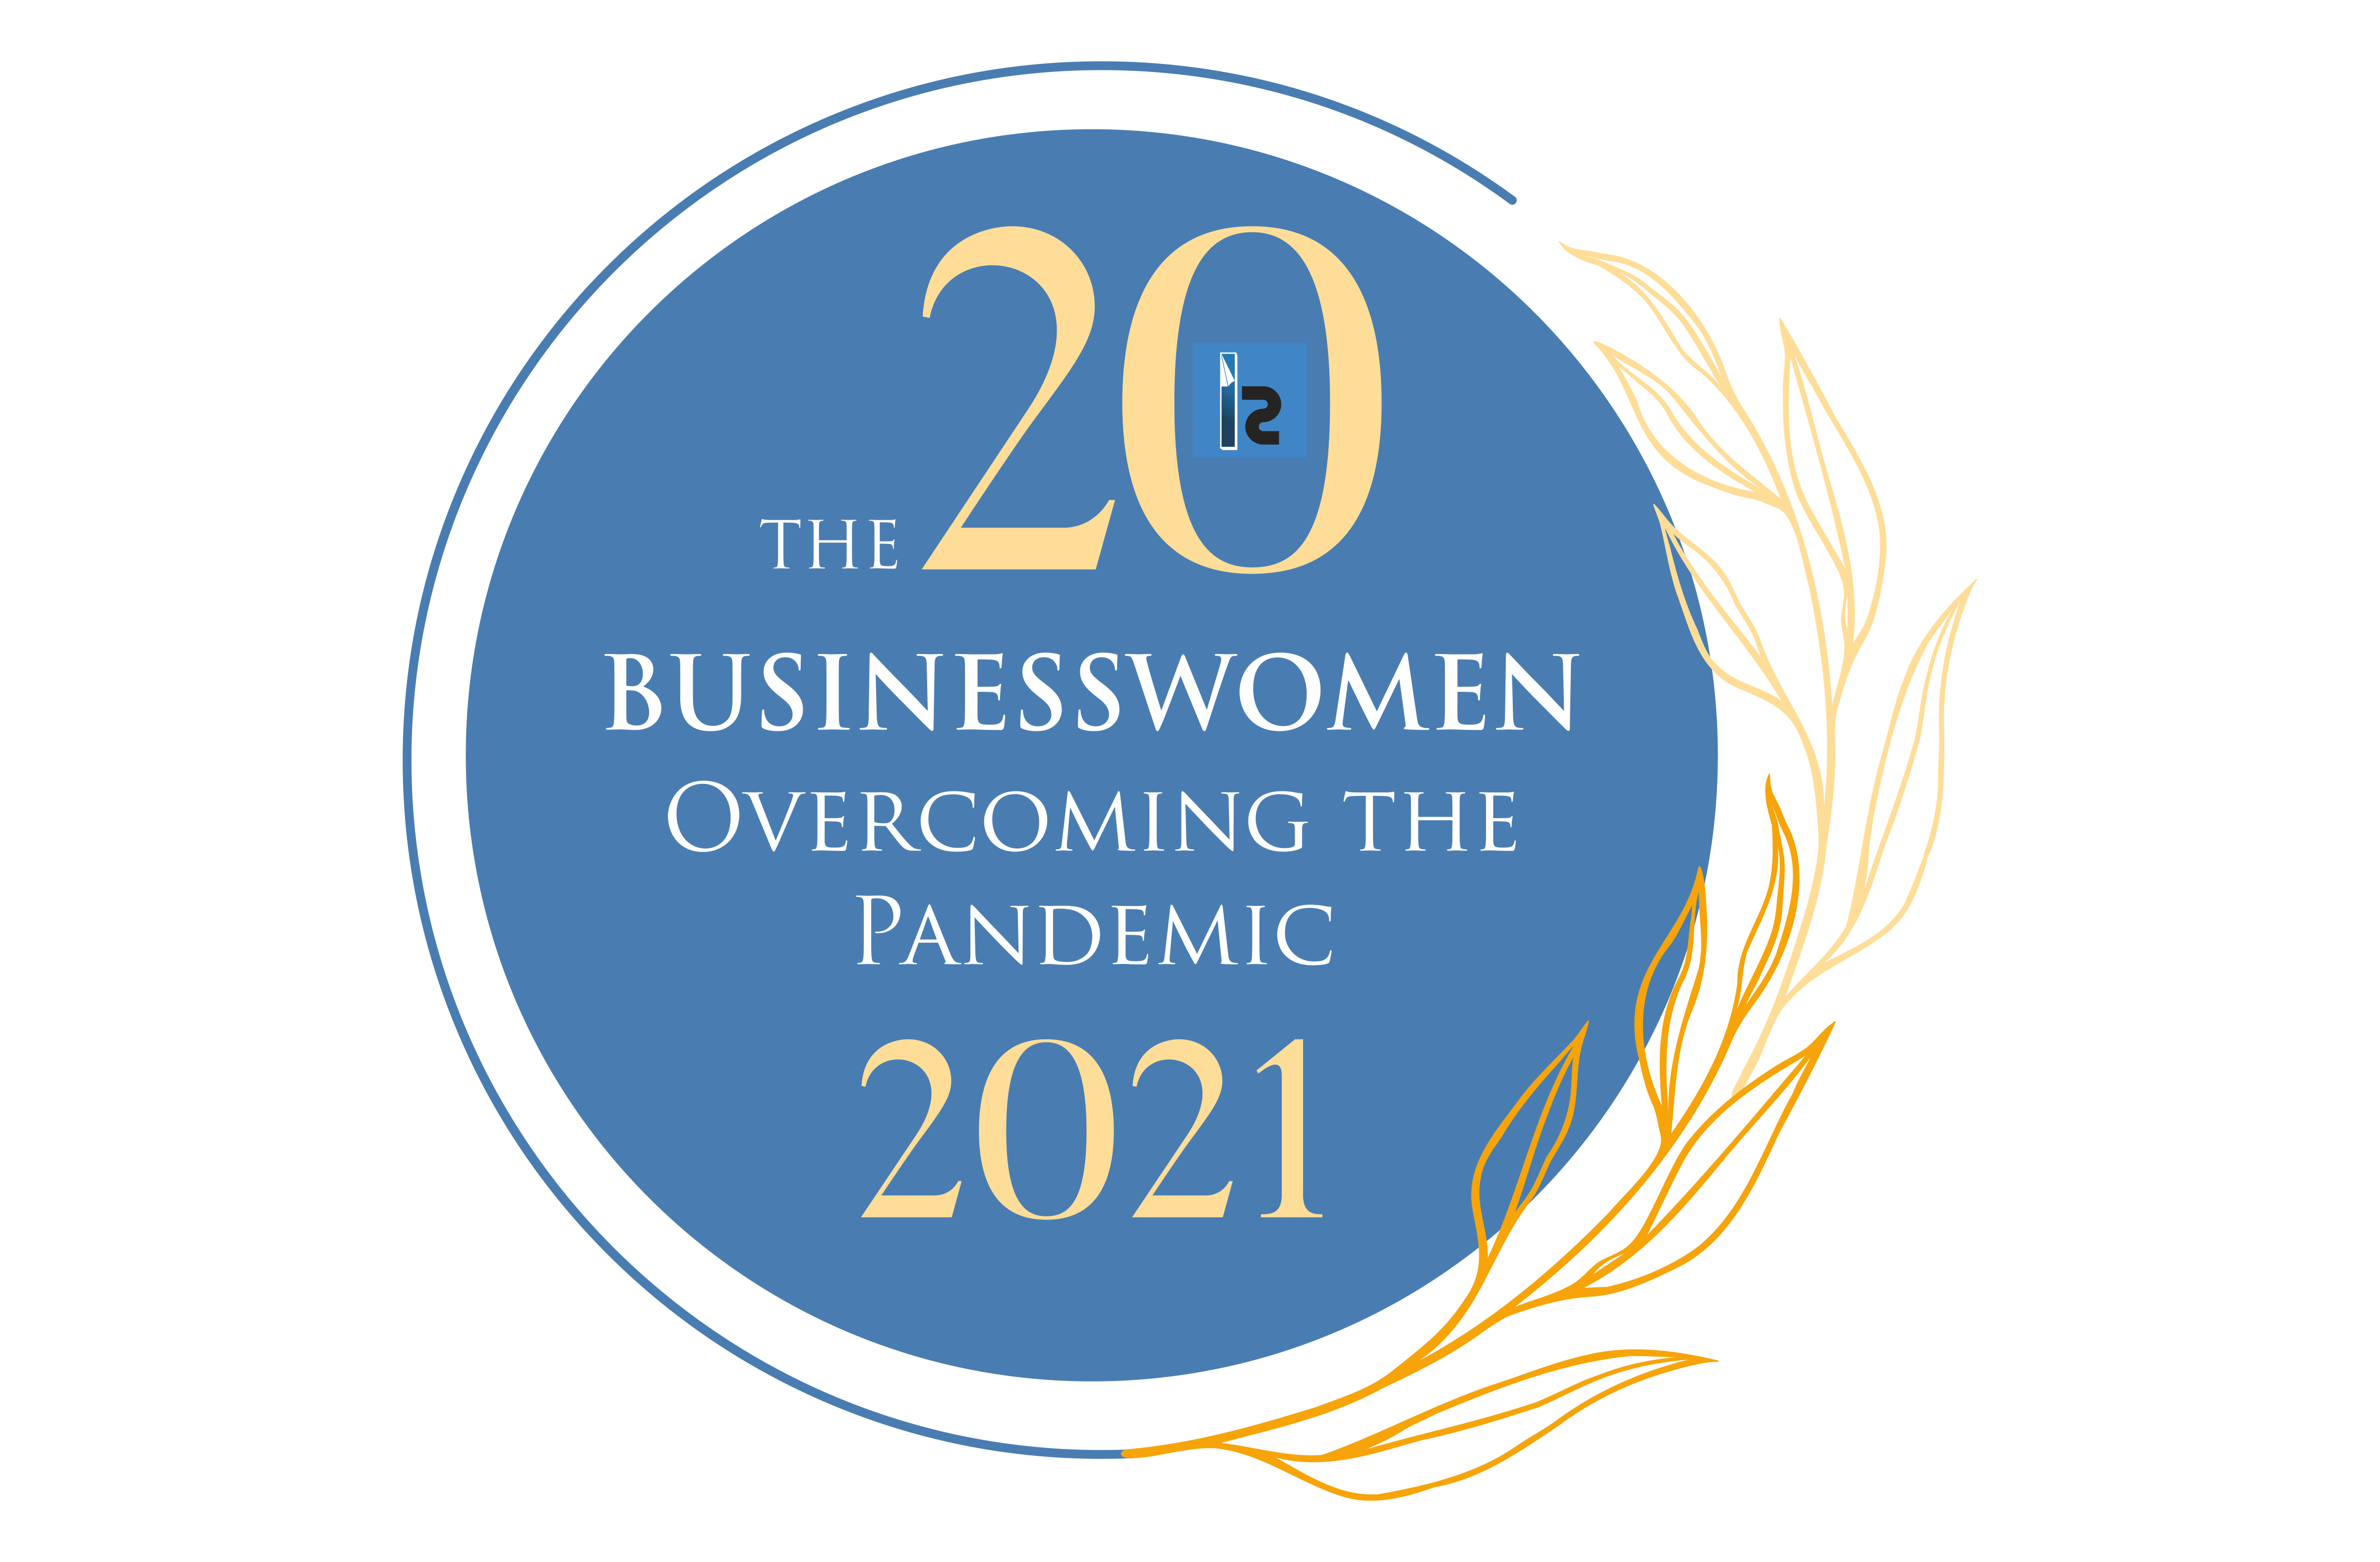 The 20 Businesswomen Overcoming the Pandemic 2021